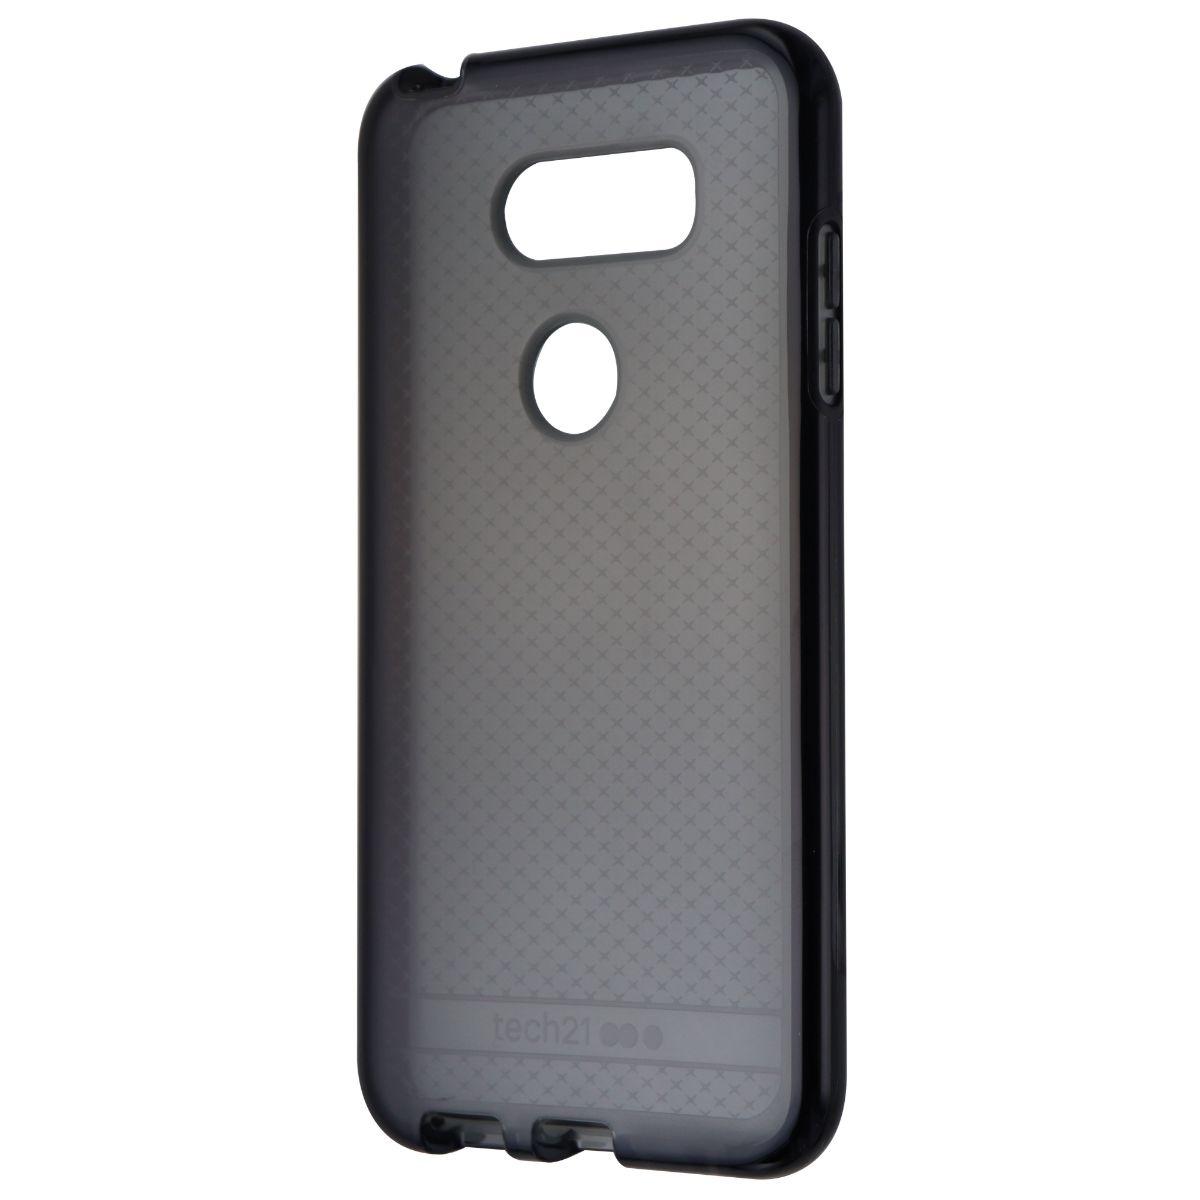 new arrival 29534 e71b1 Tech21 Evo Check Series Slim Gel Protective Case Cover for LG V30 ...